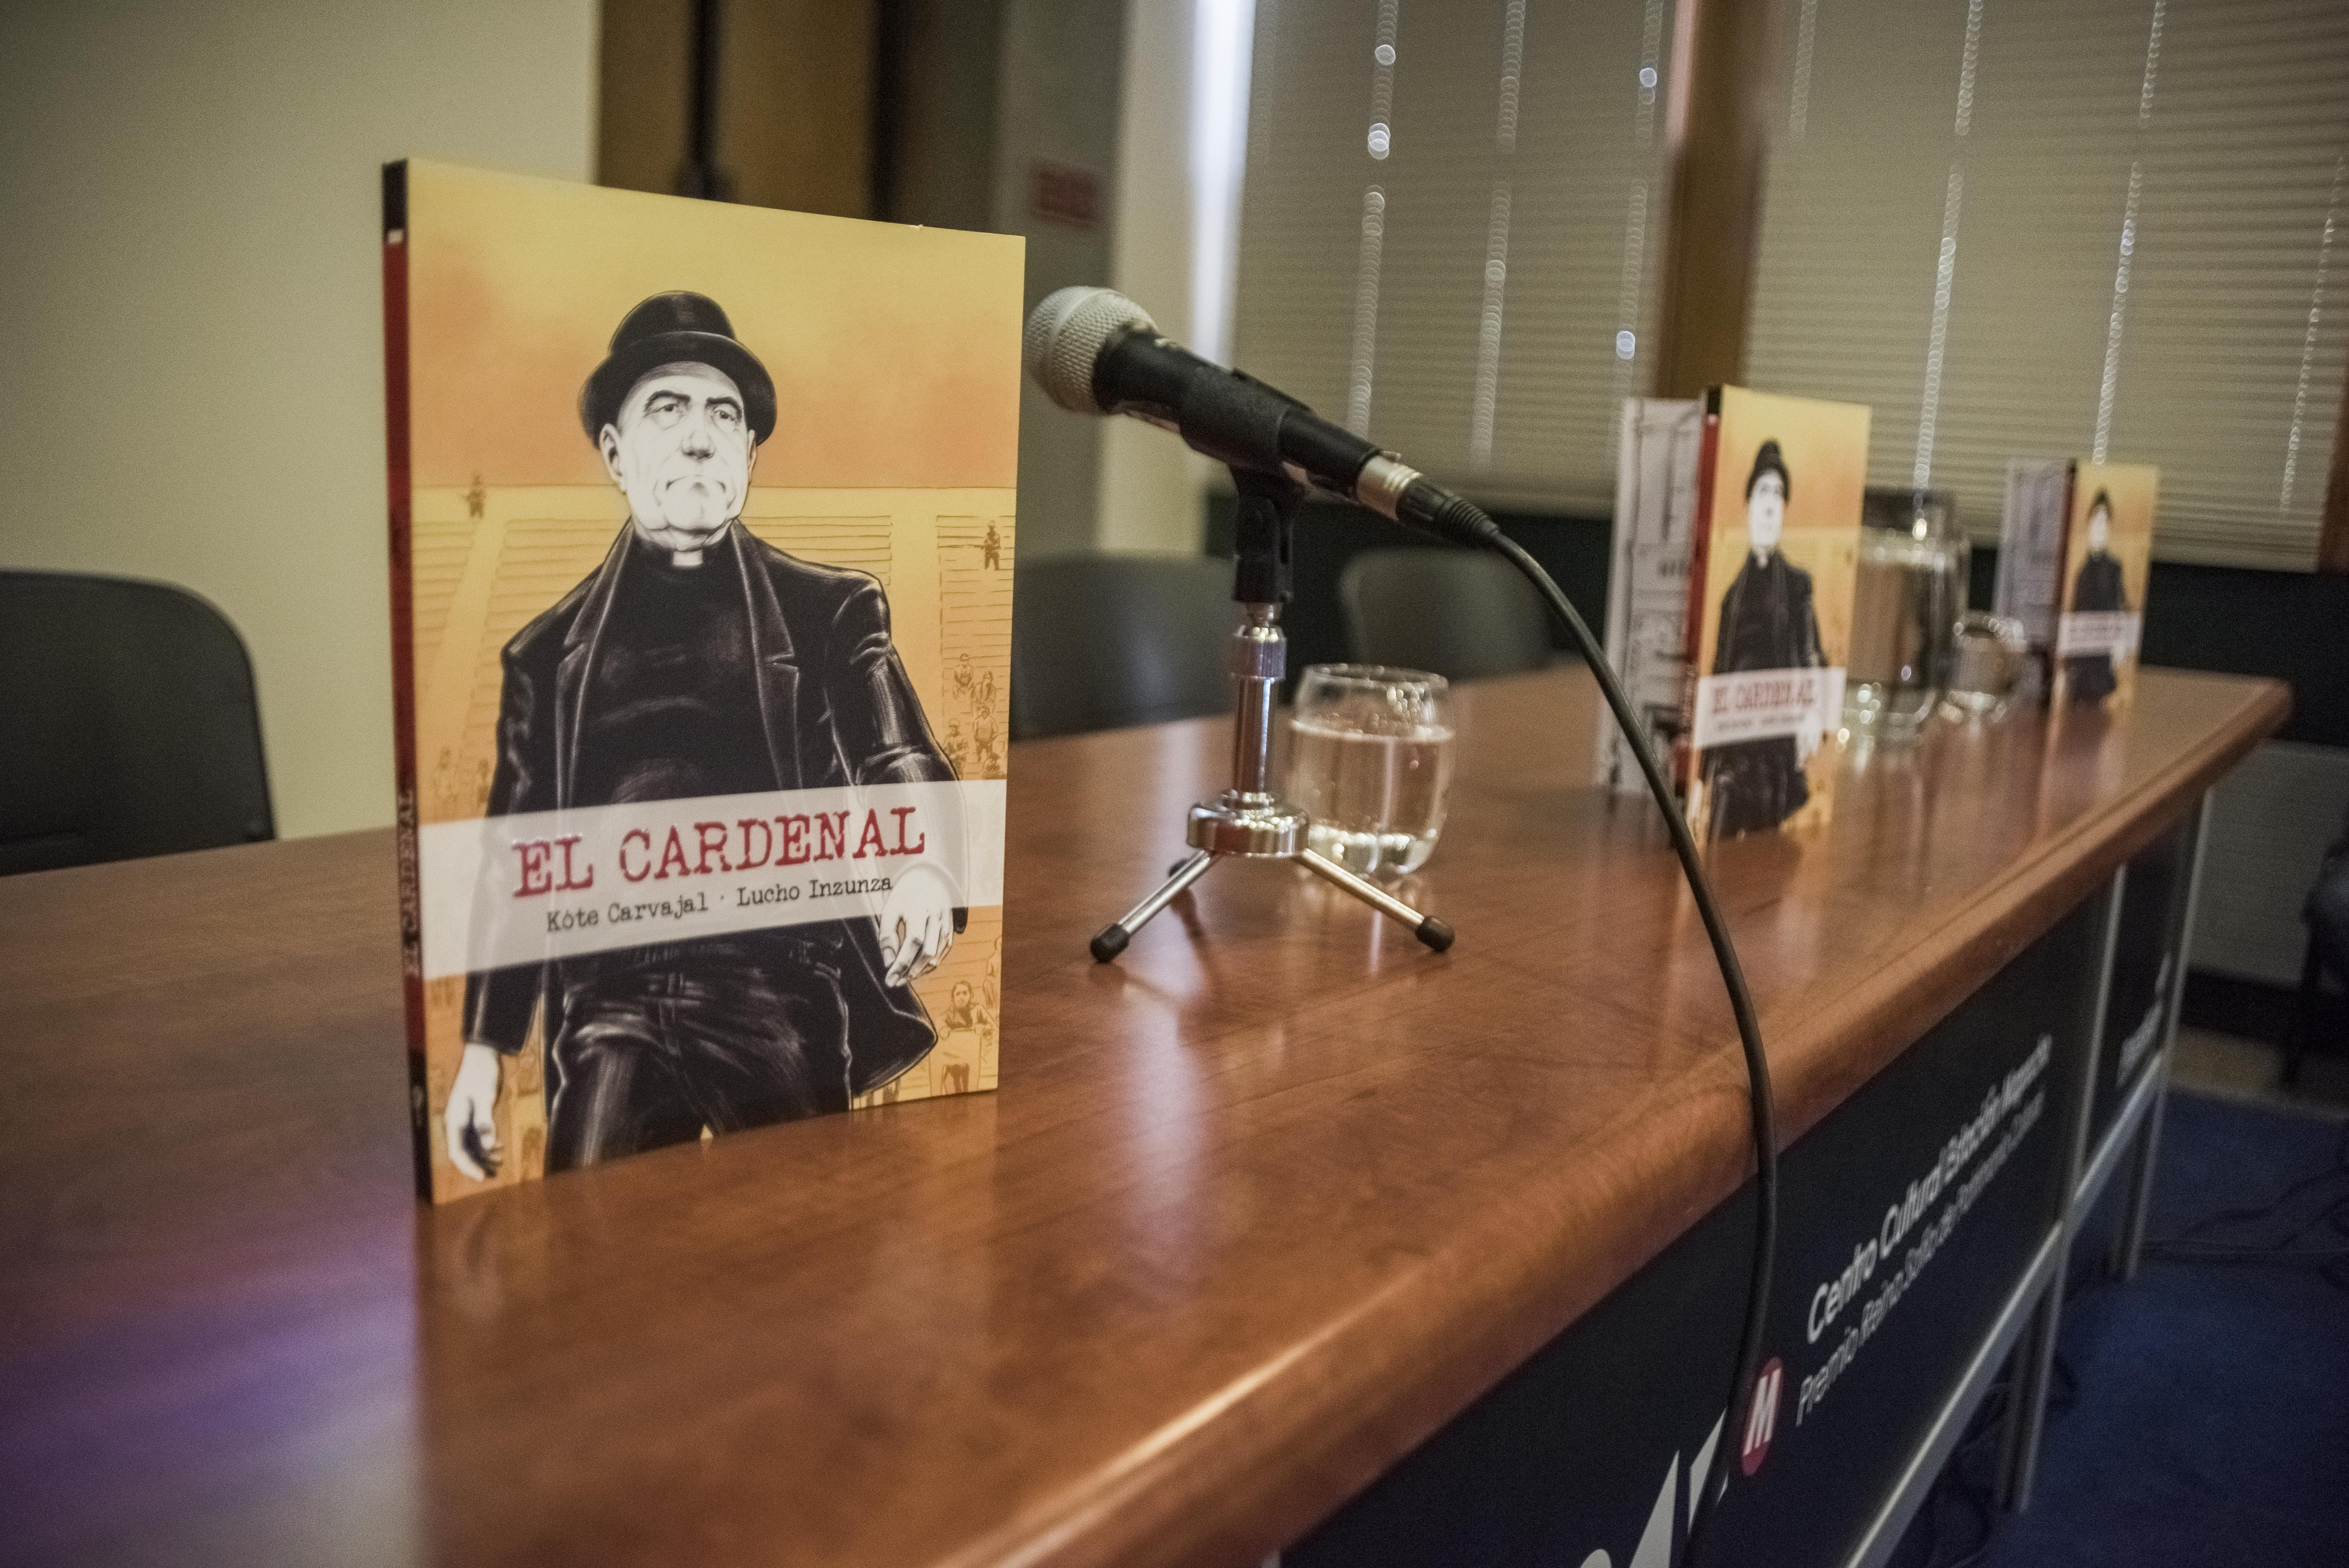 Novela gráfica El Cardenal será presentada en Viña del Mar